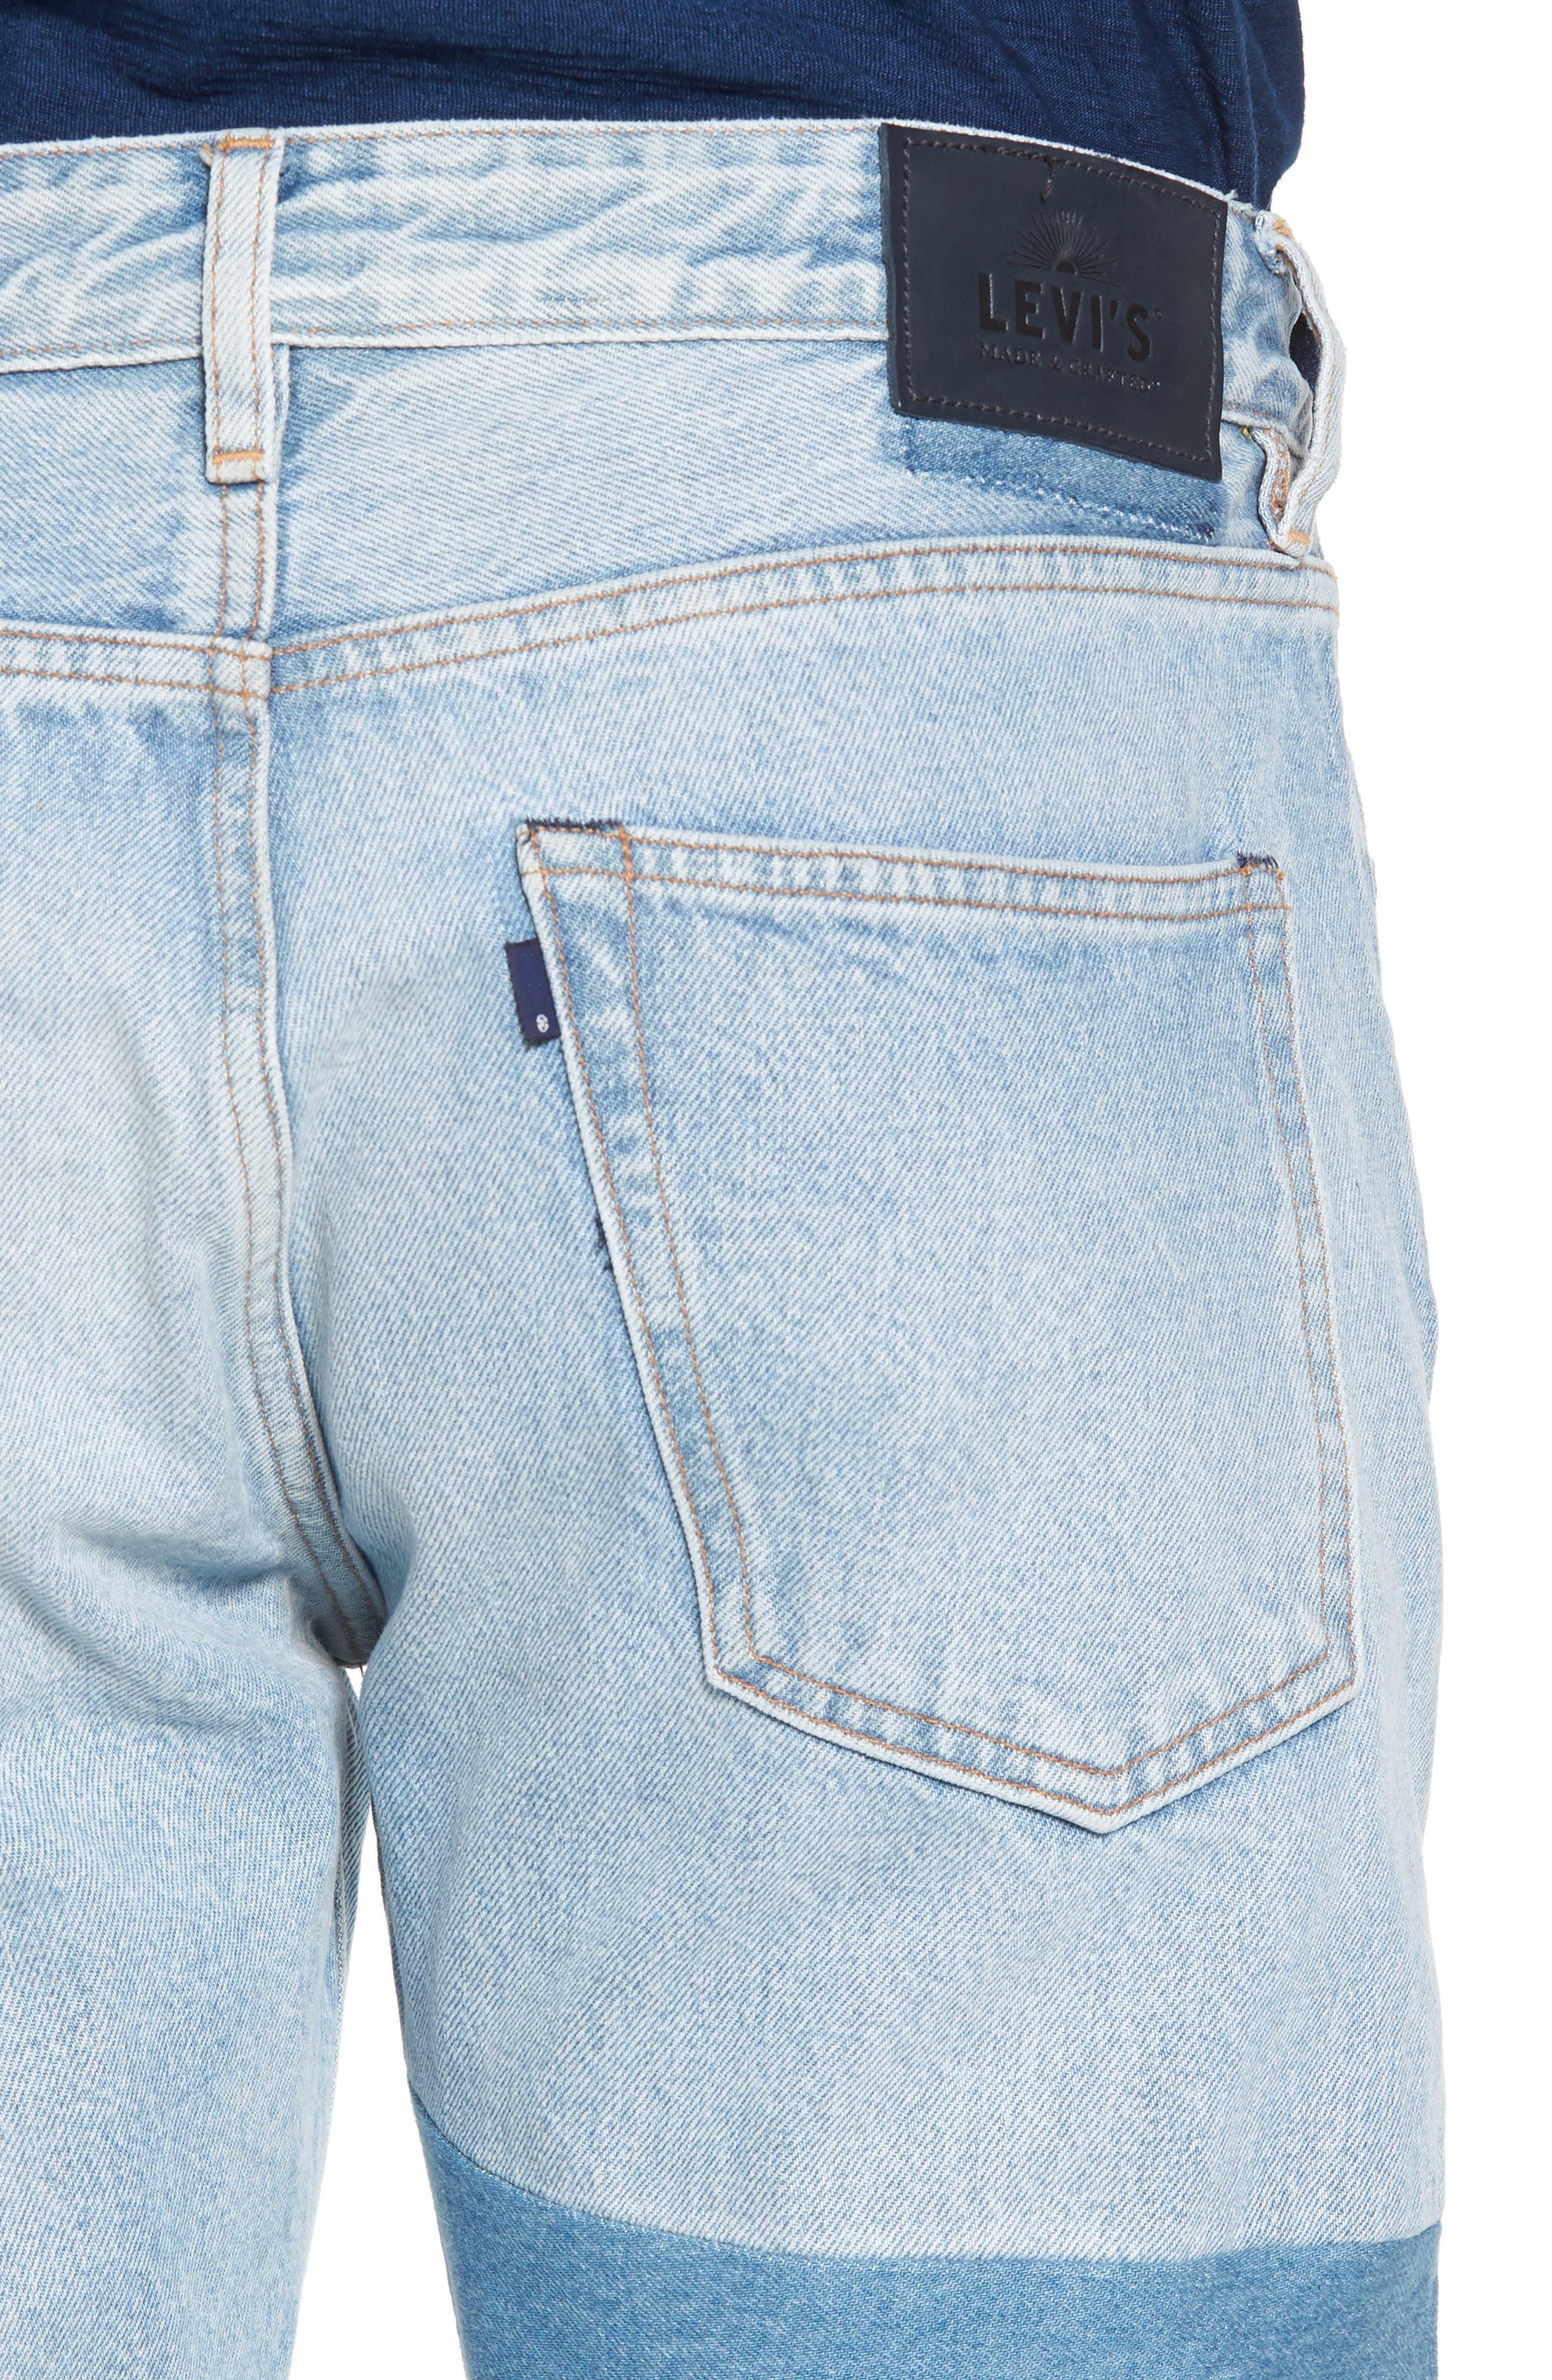 Studio Slim Fit Jeans,                             Alternate thumbnail 4, color,